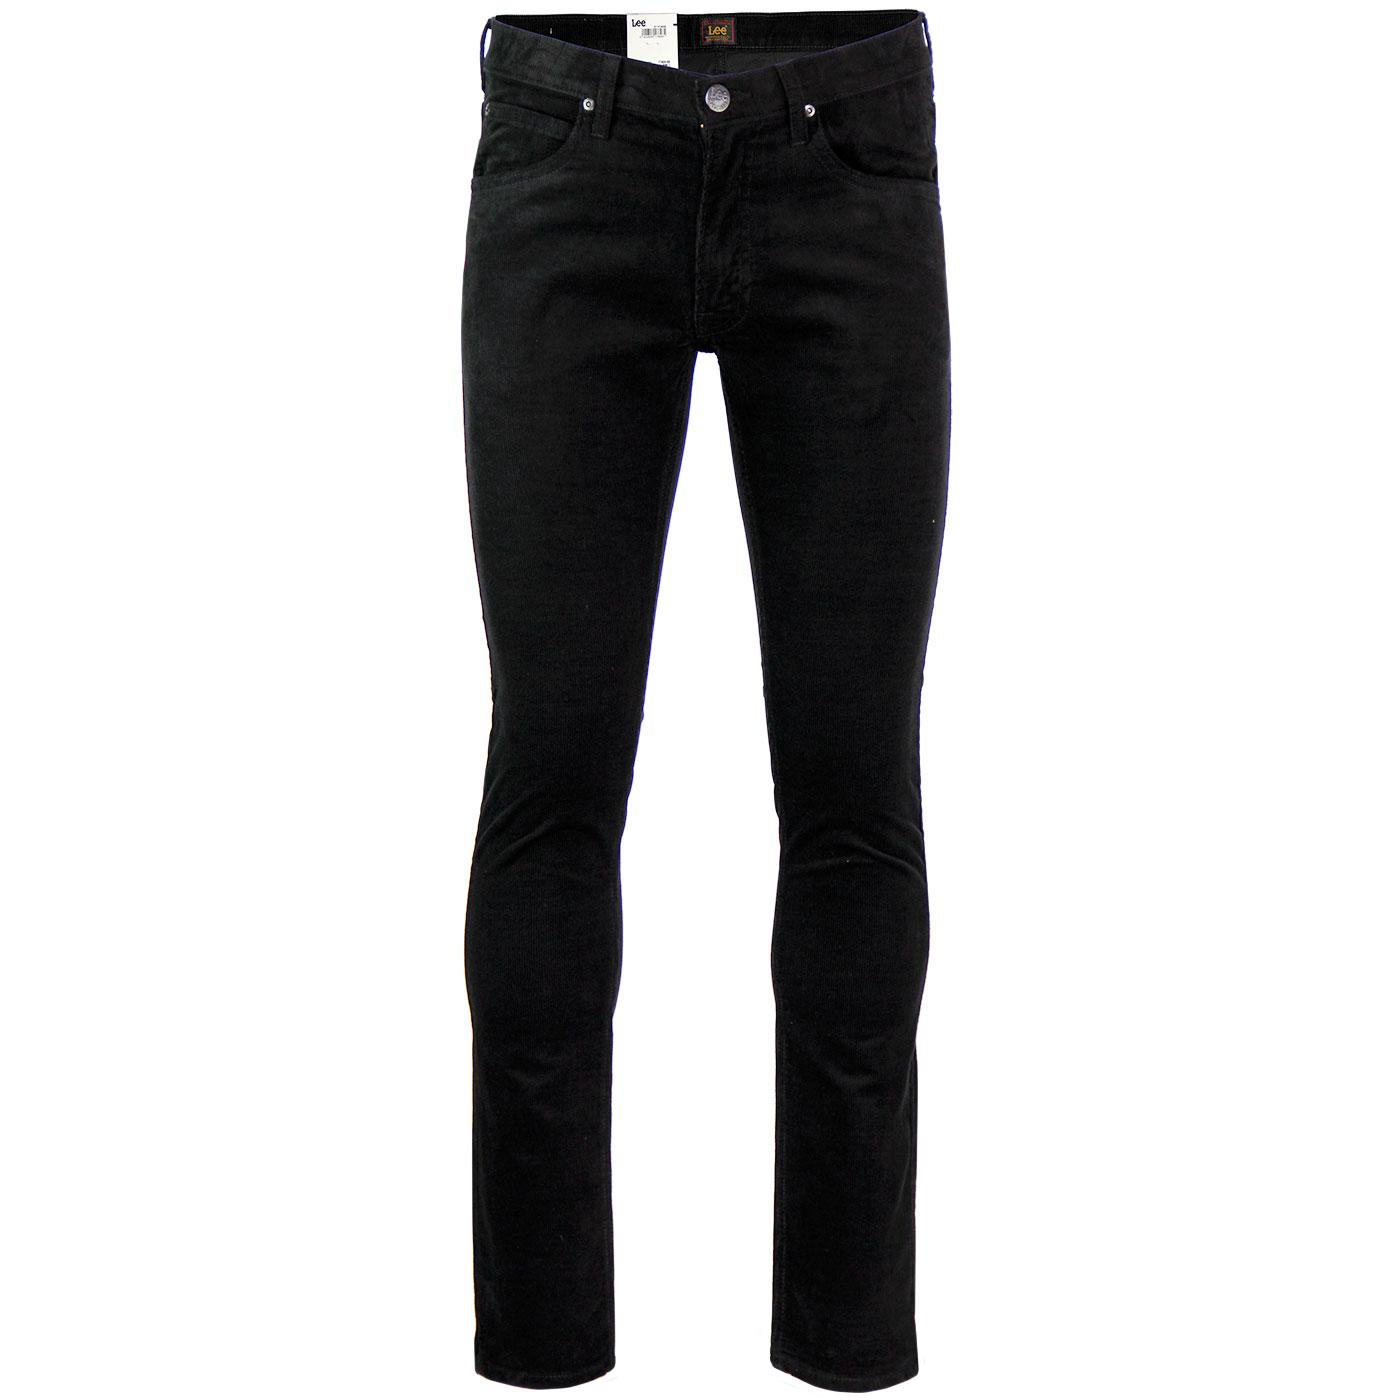 Luke LEE JEANS Mod Slim Tapered Cord Jeans (B)